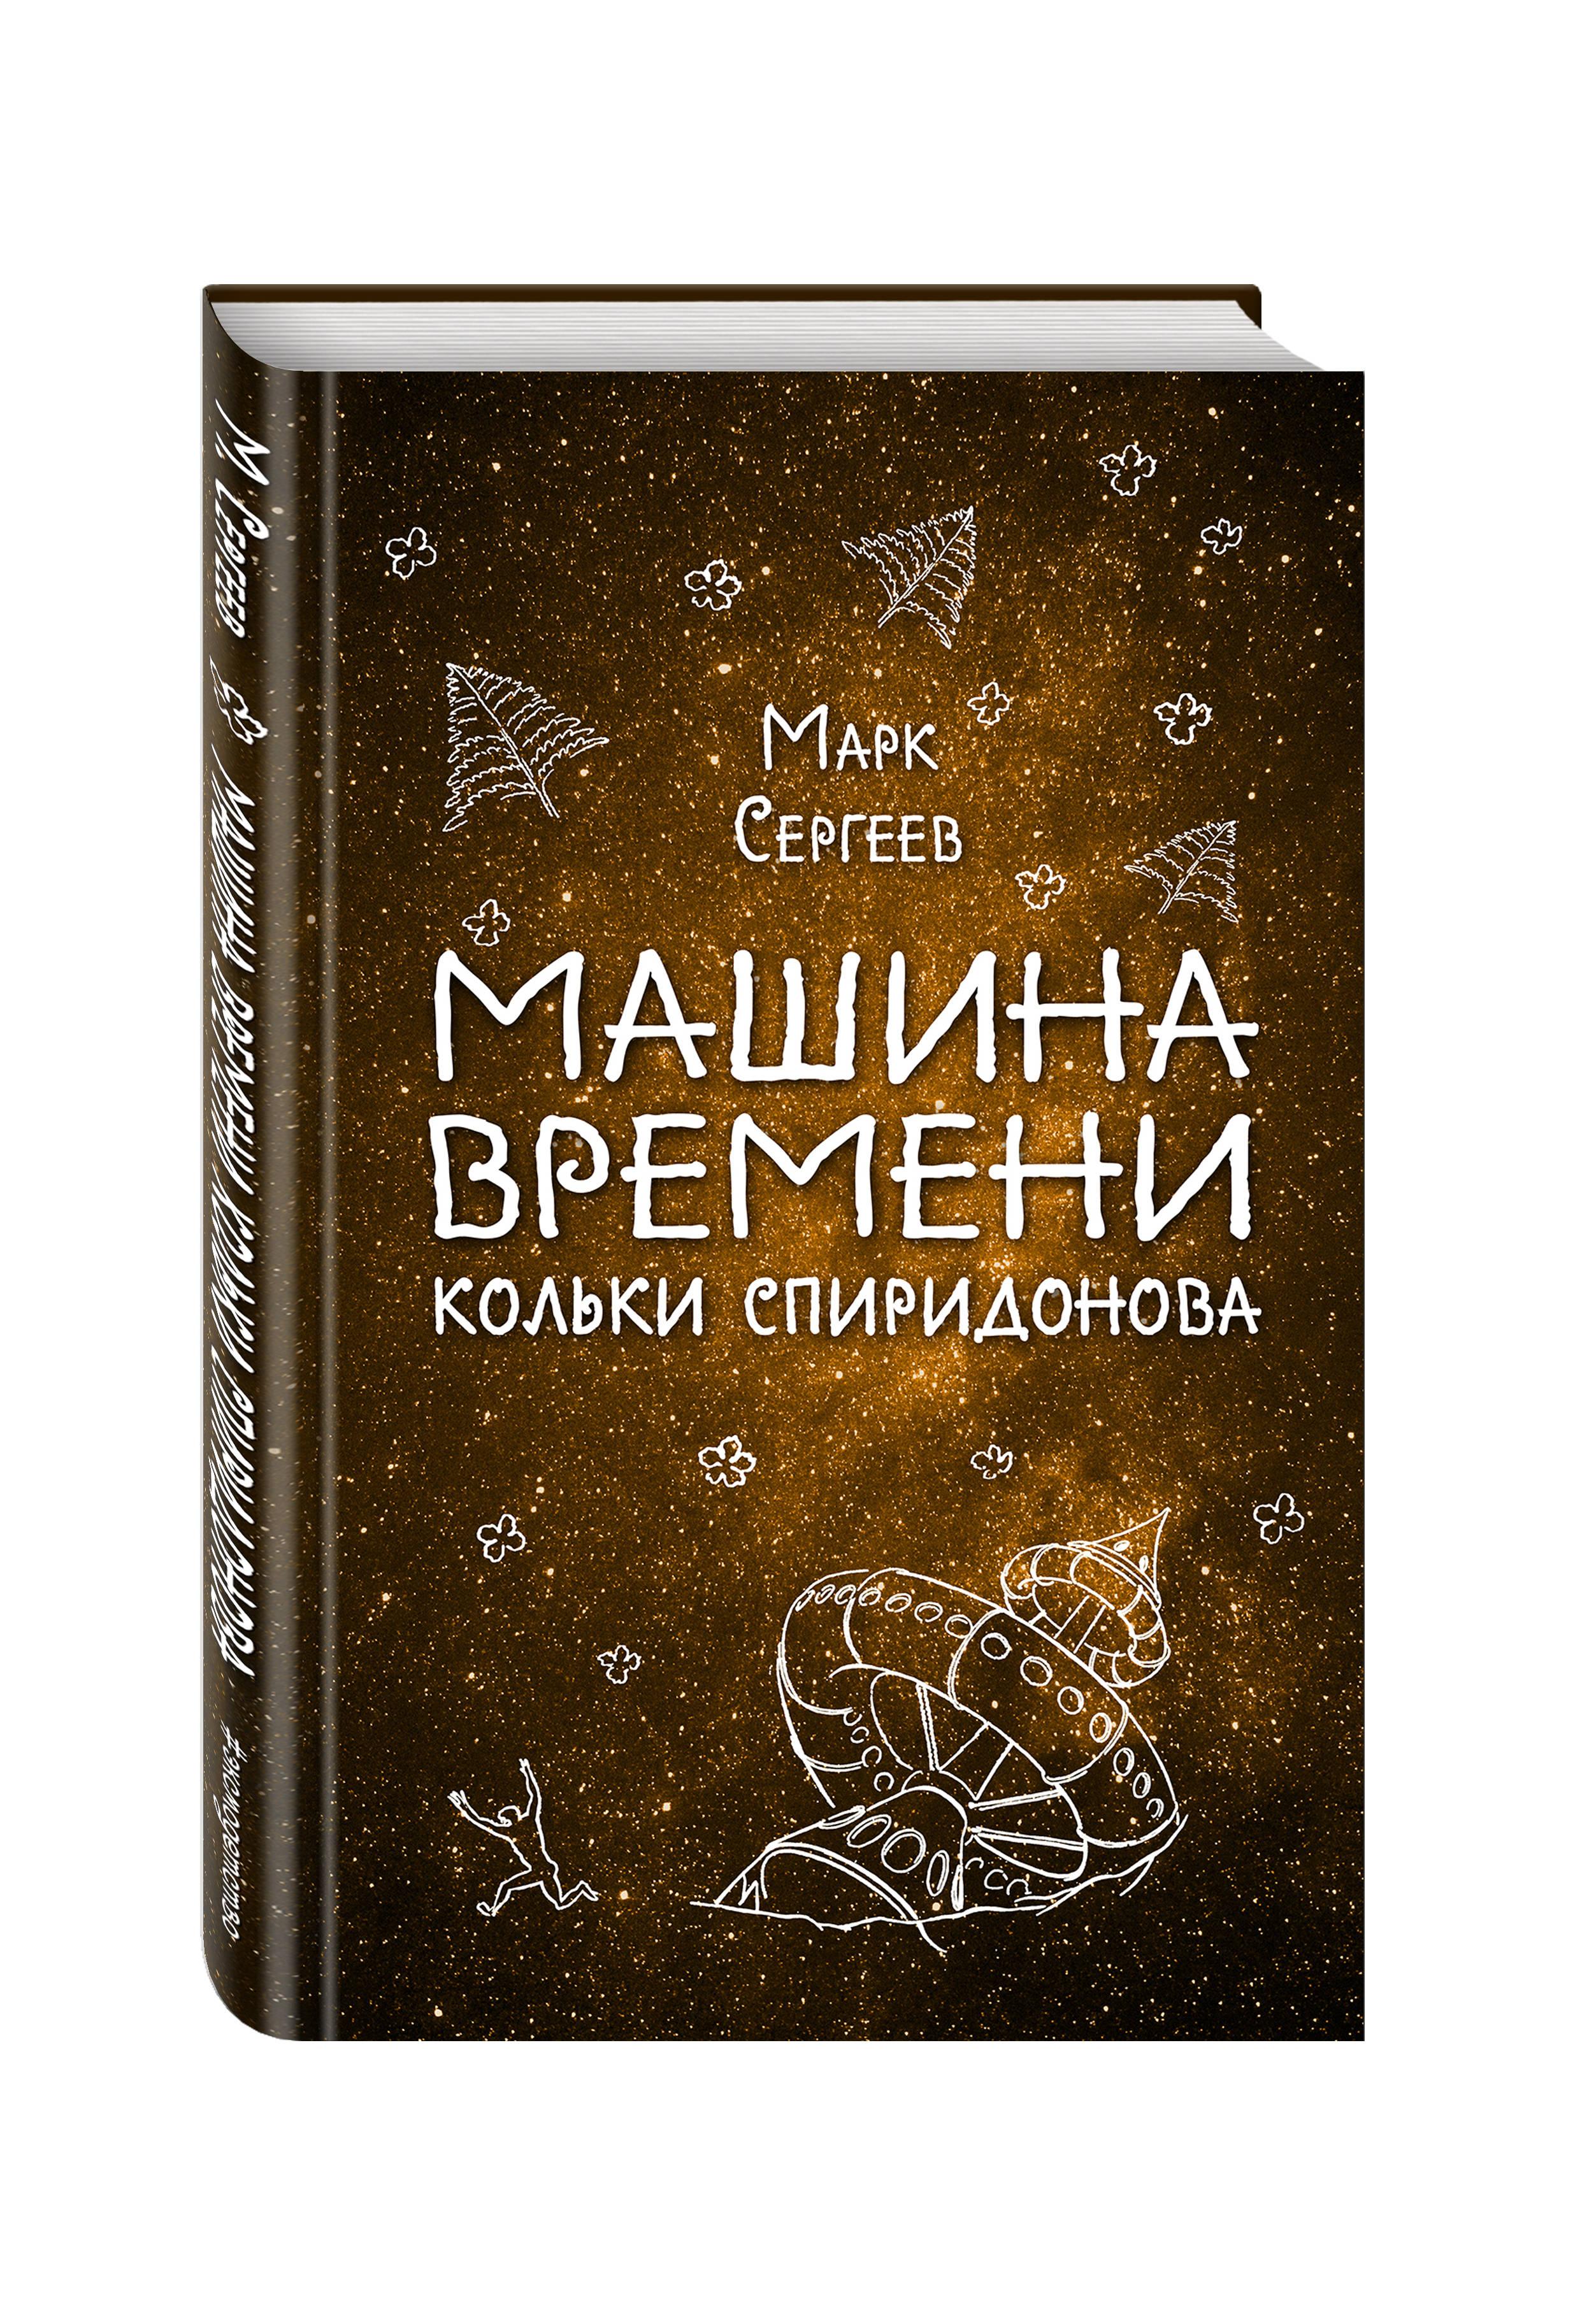 Марк Сергеев Машина времени Кольки Спиридонова